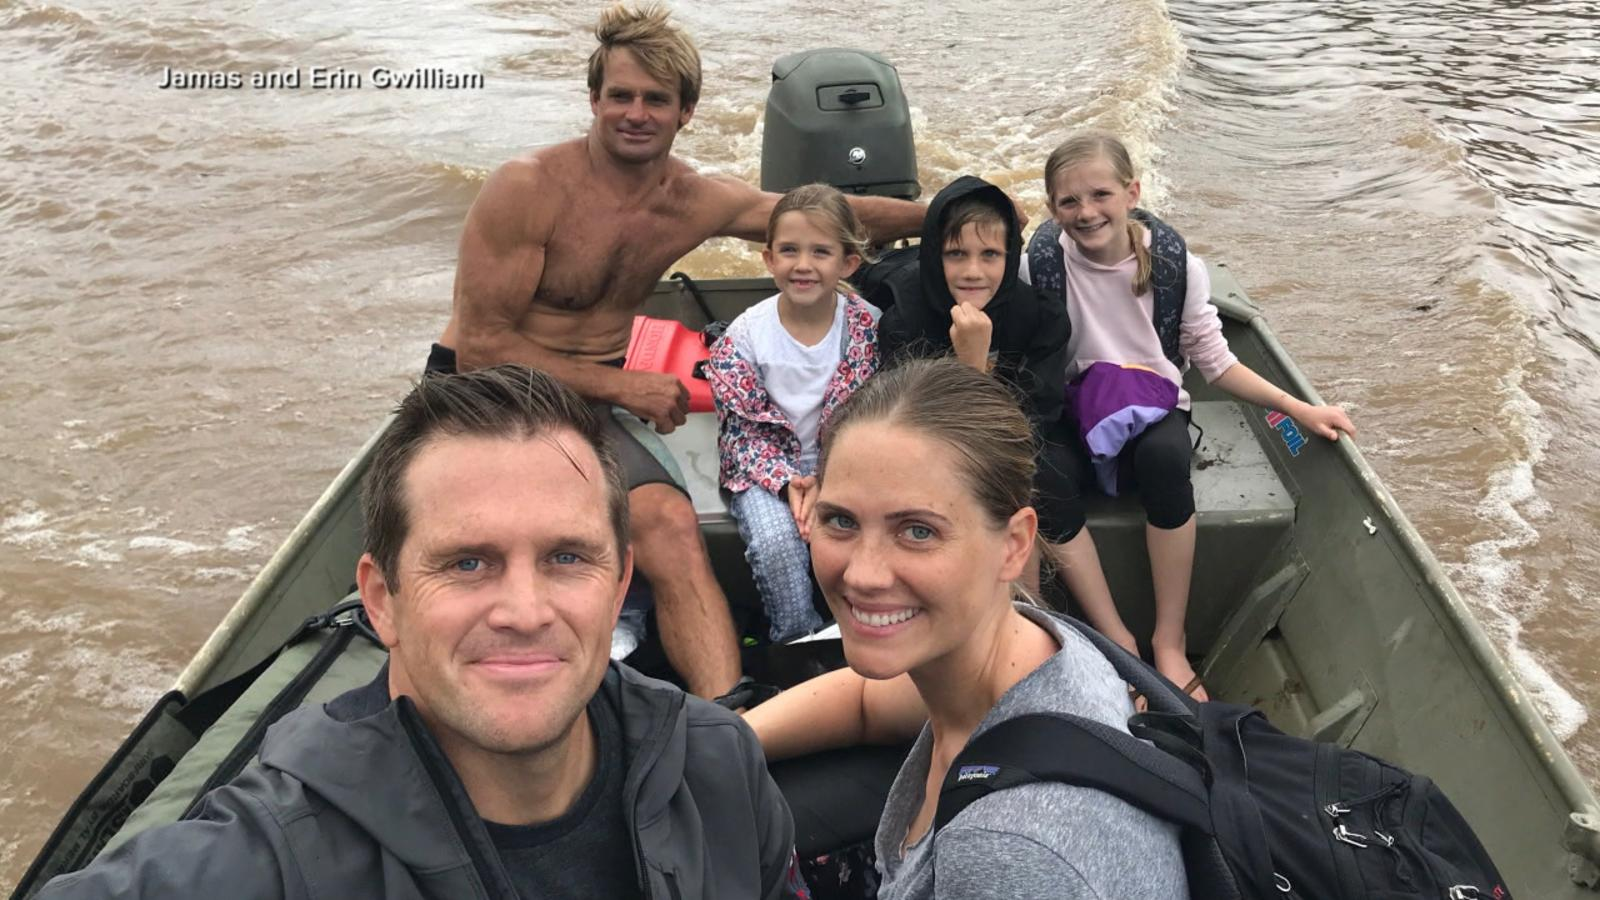 VIDEO: Pro surfer saves lives amid torrential Hawaii rain